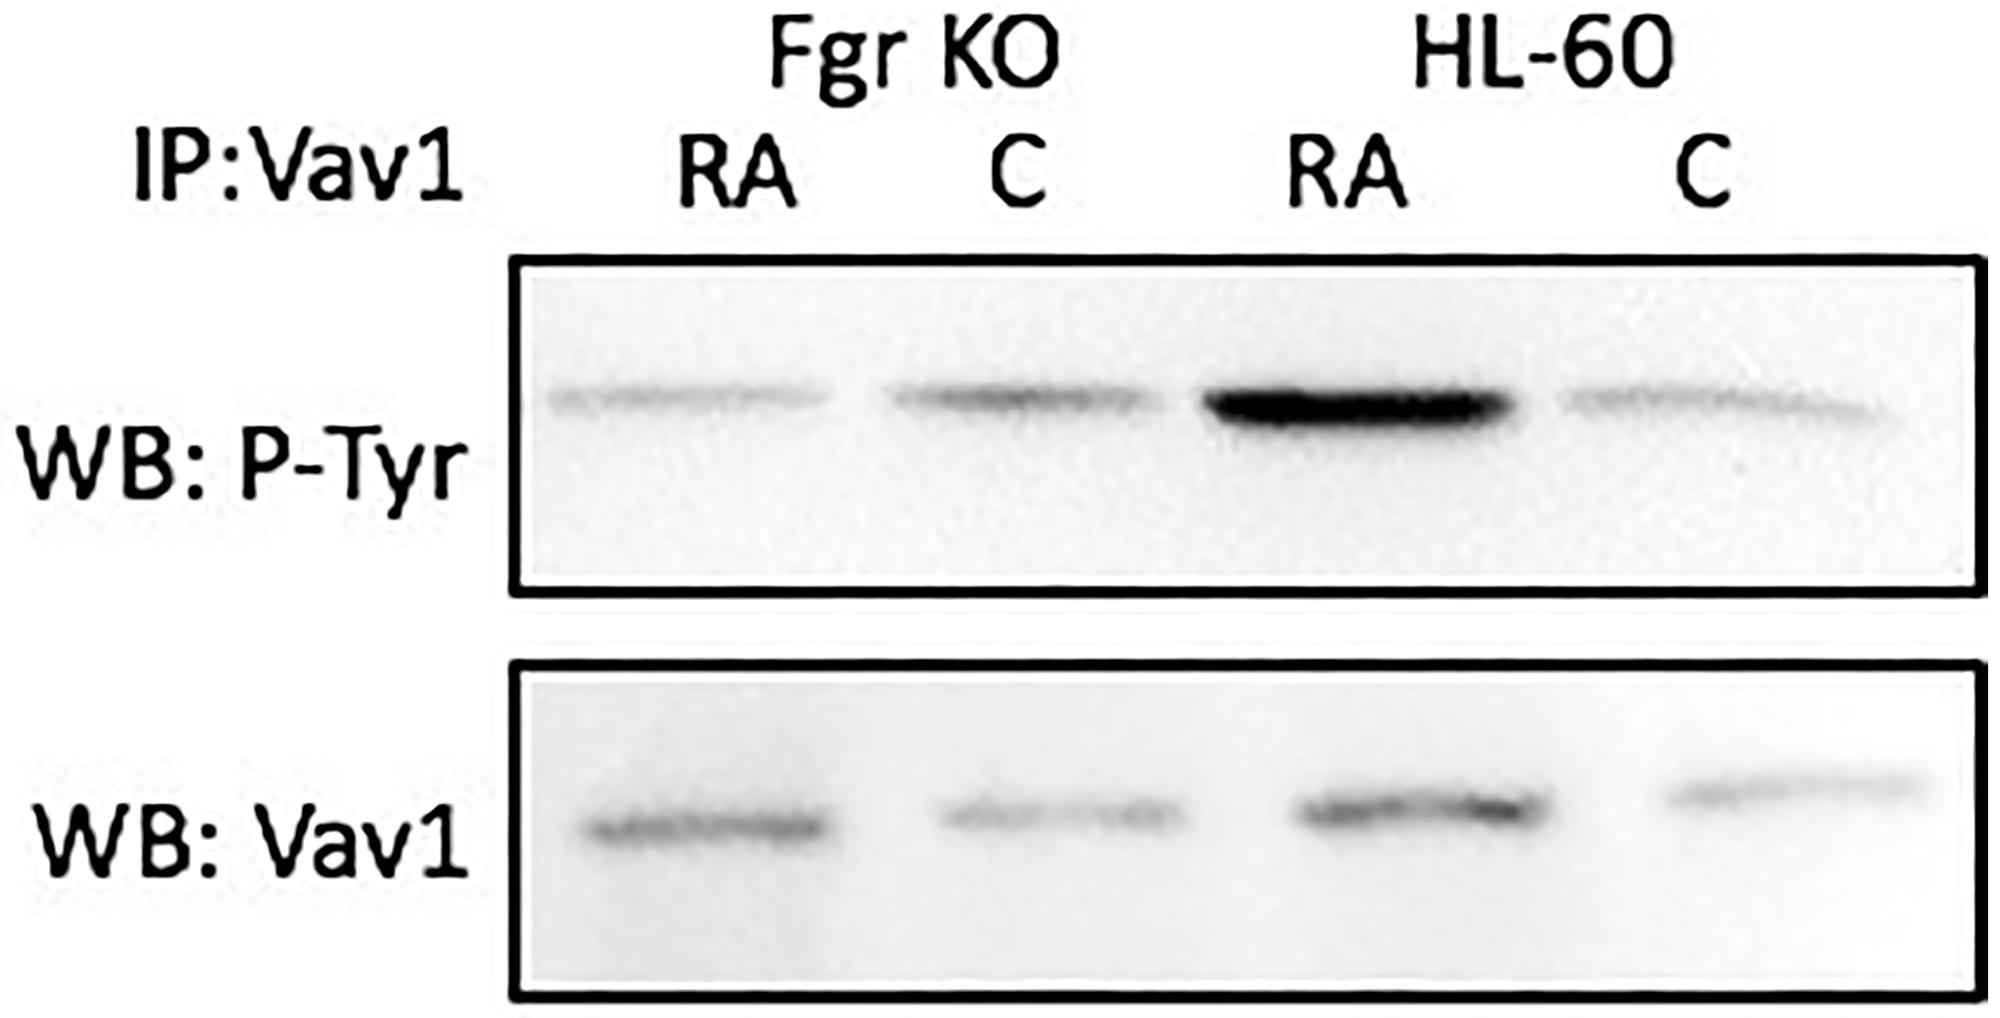 Vav tyrosine phosphorylation in HL-60 wt and Fgr KO cells assessed by immunoprecipitation.